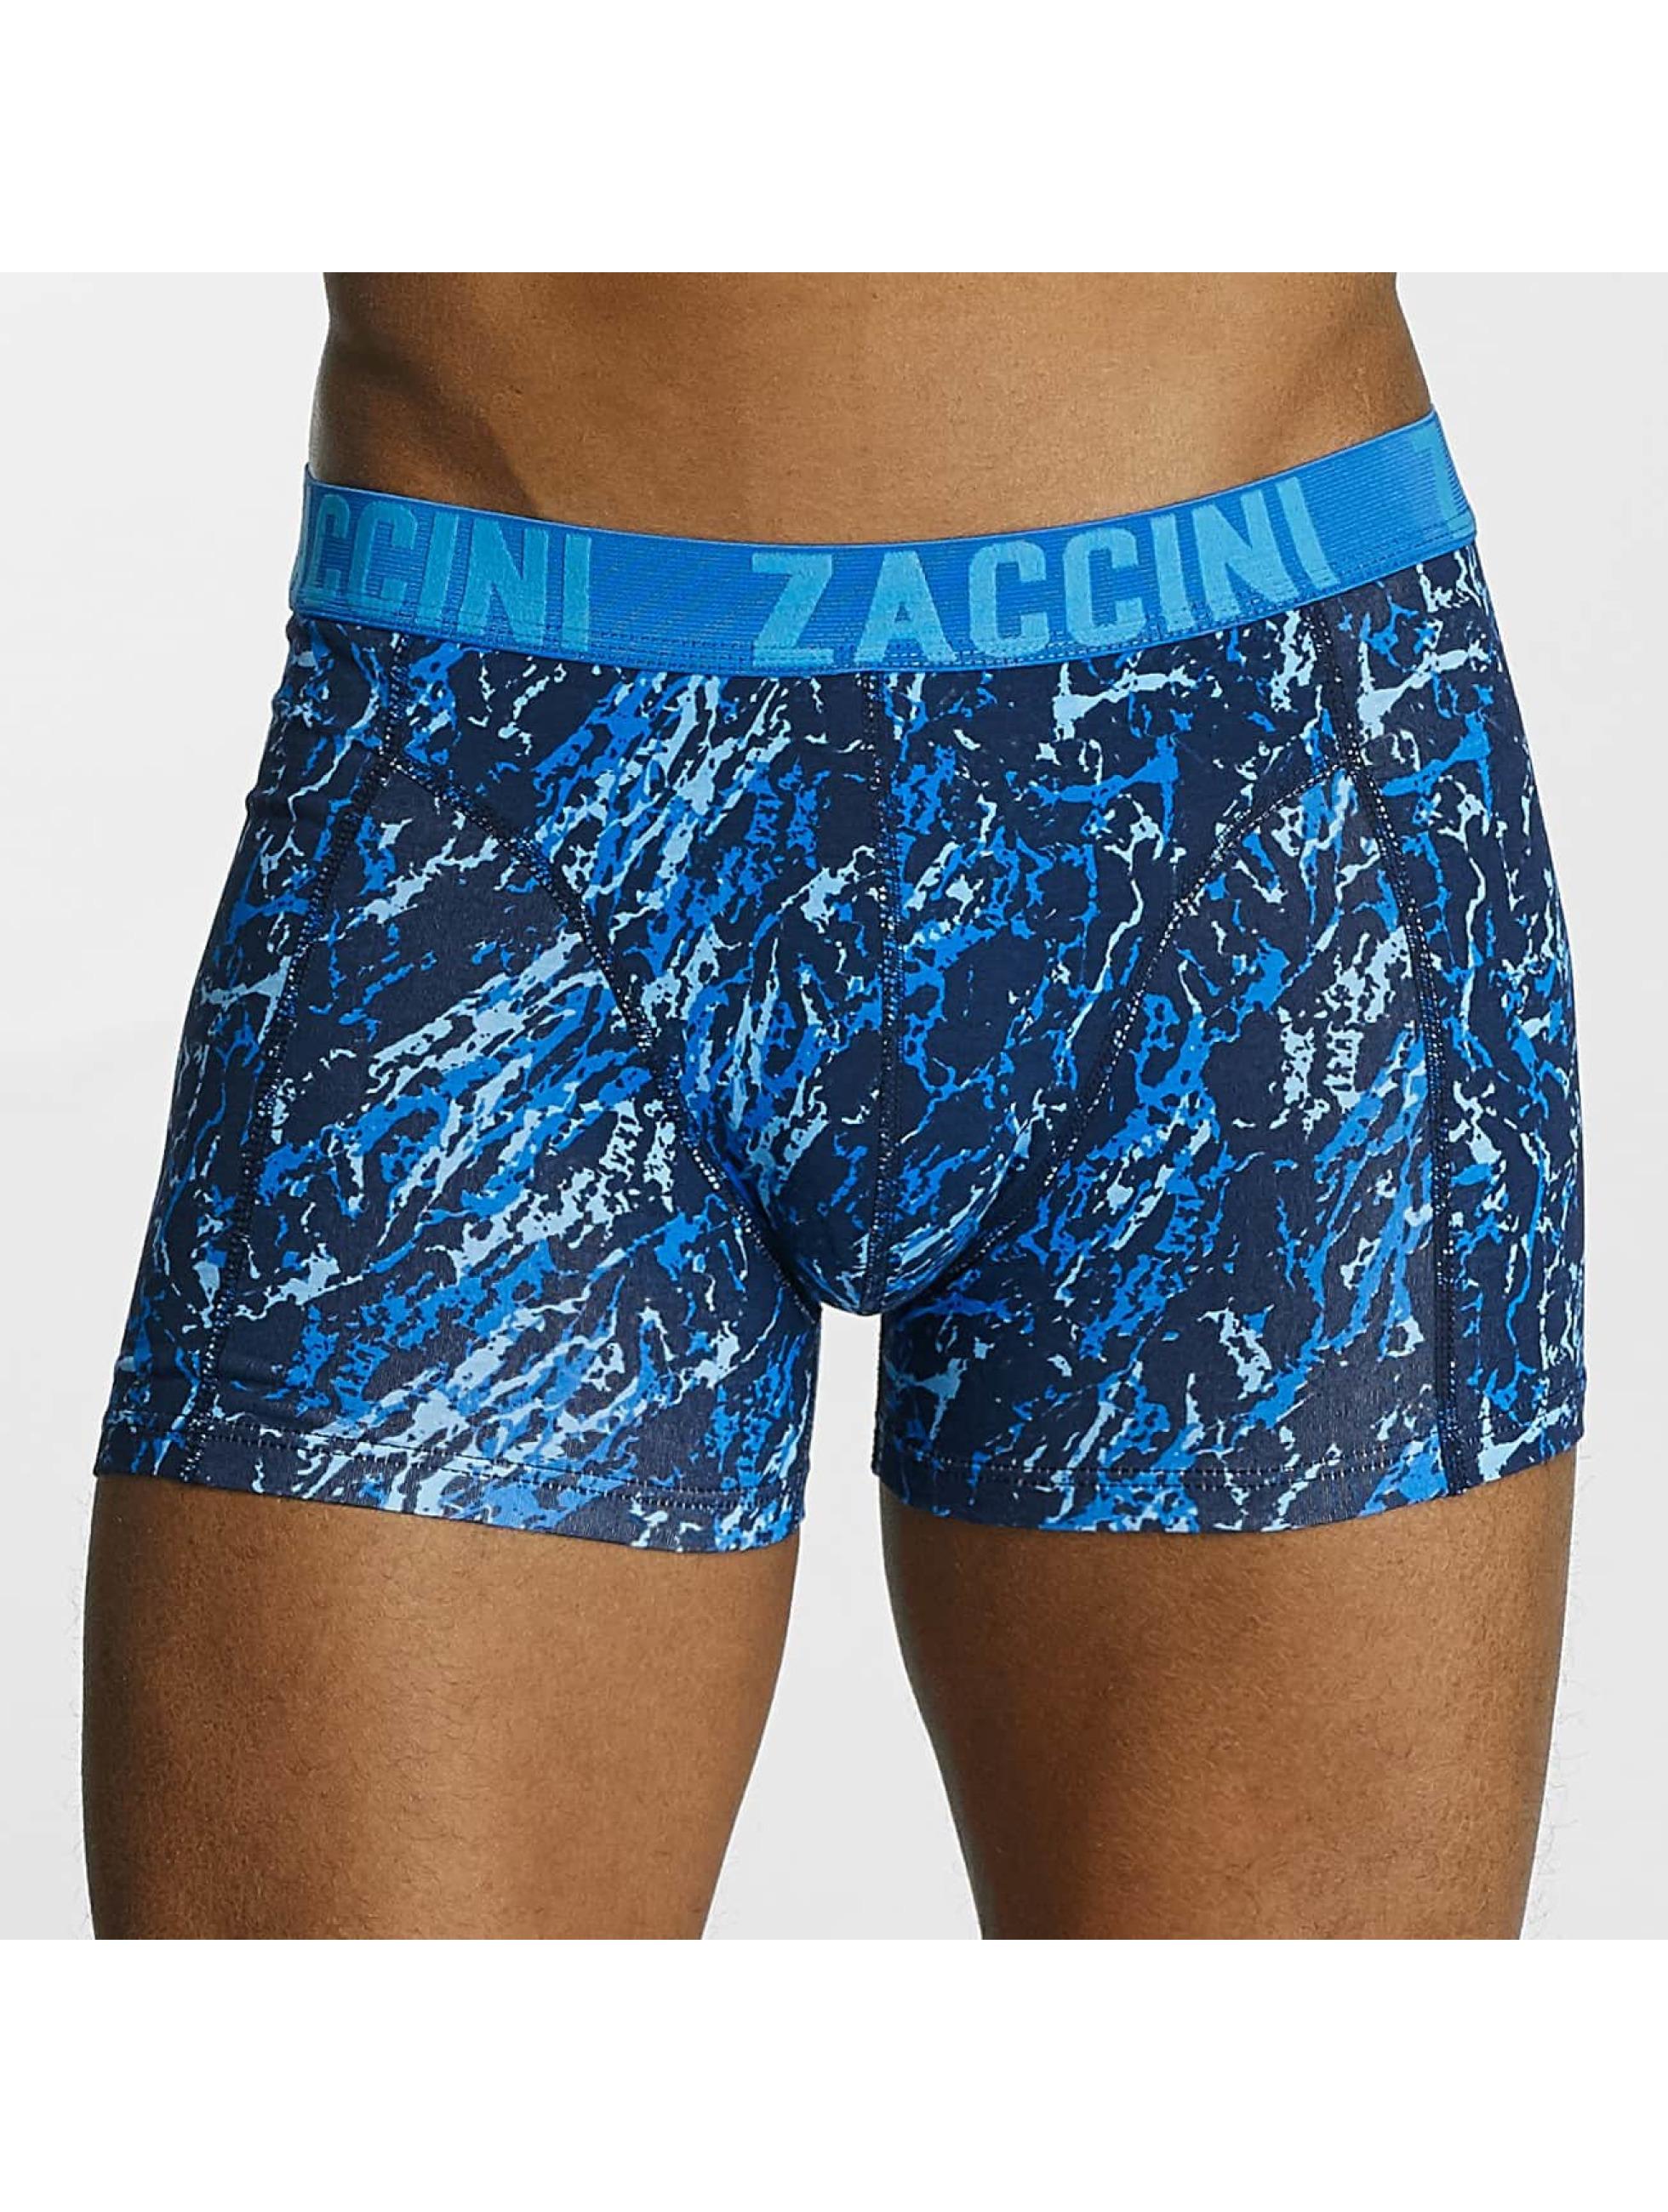 Zaccini Семейные трусы Mineral синий